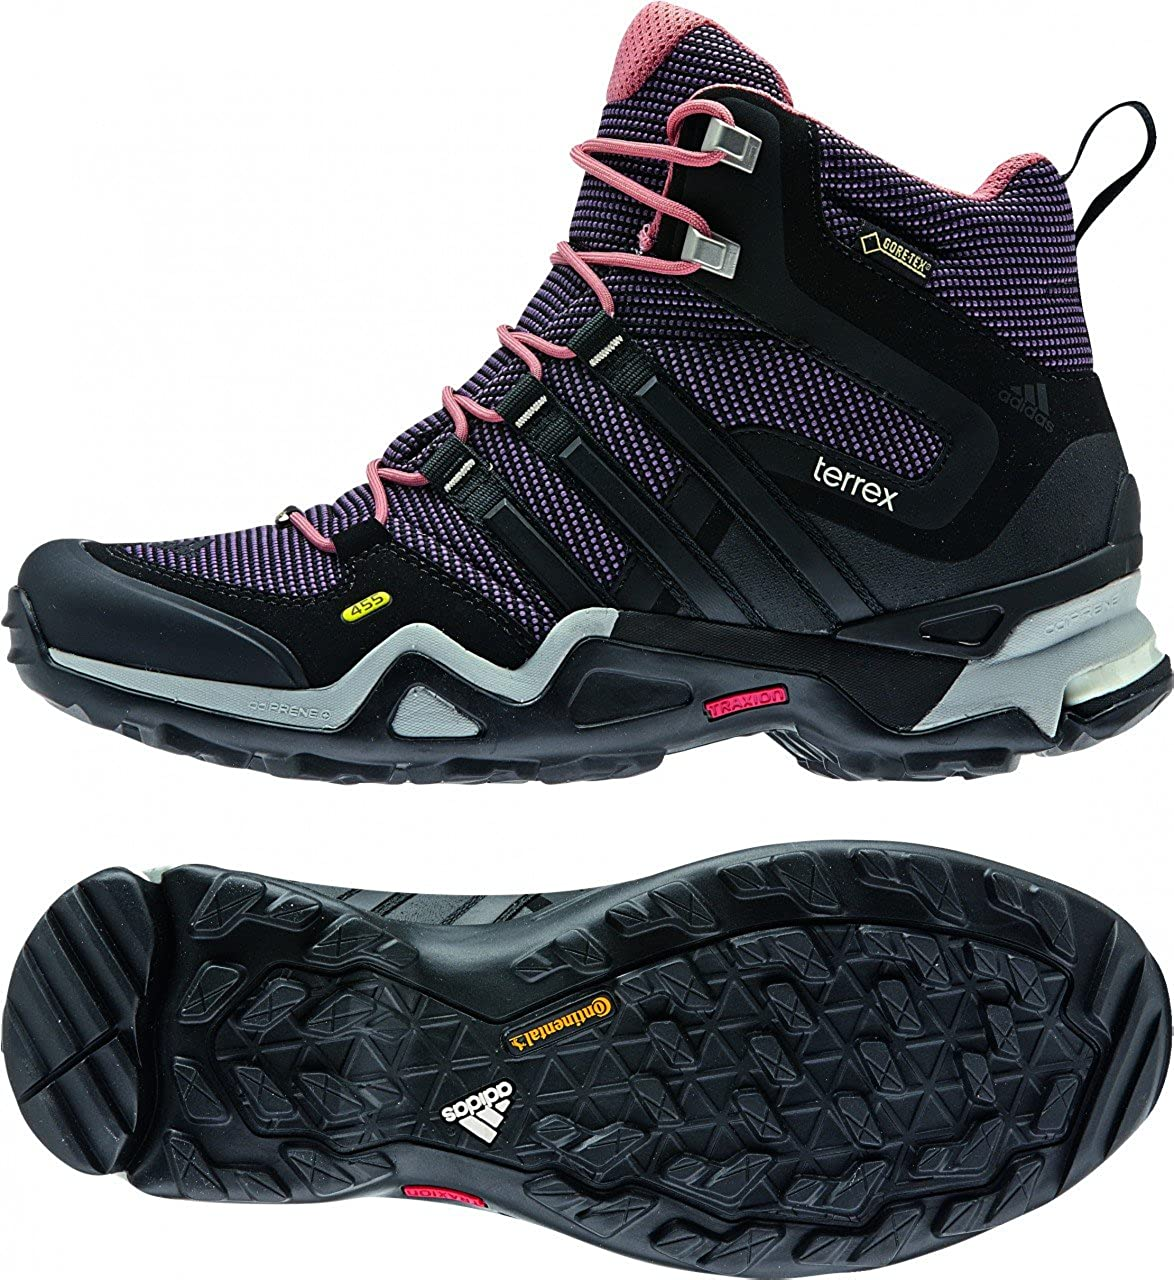 adidas Terrex Fast X High Gore TEX Women's Trail Botte De